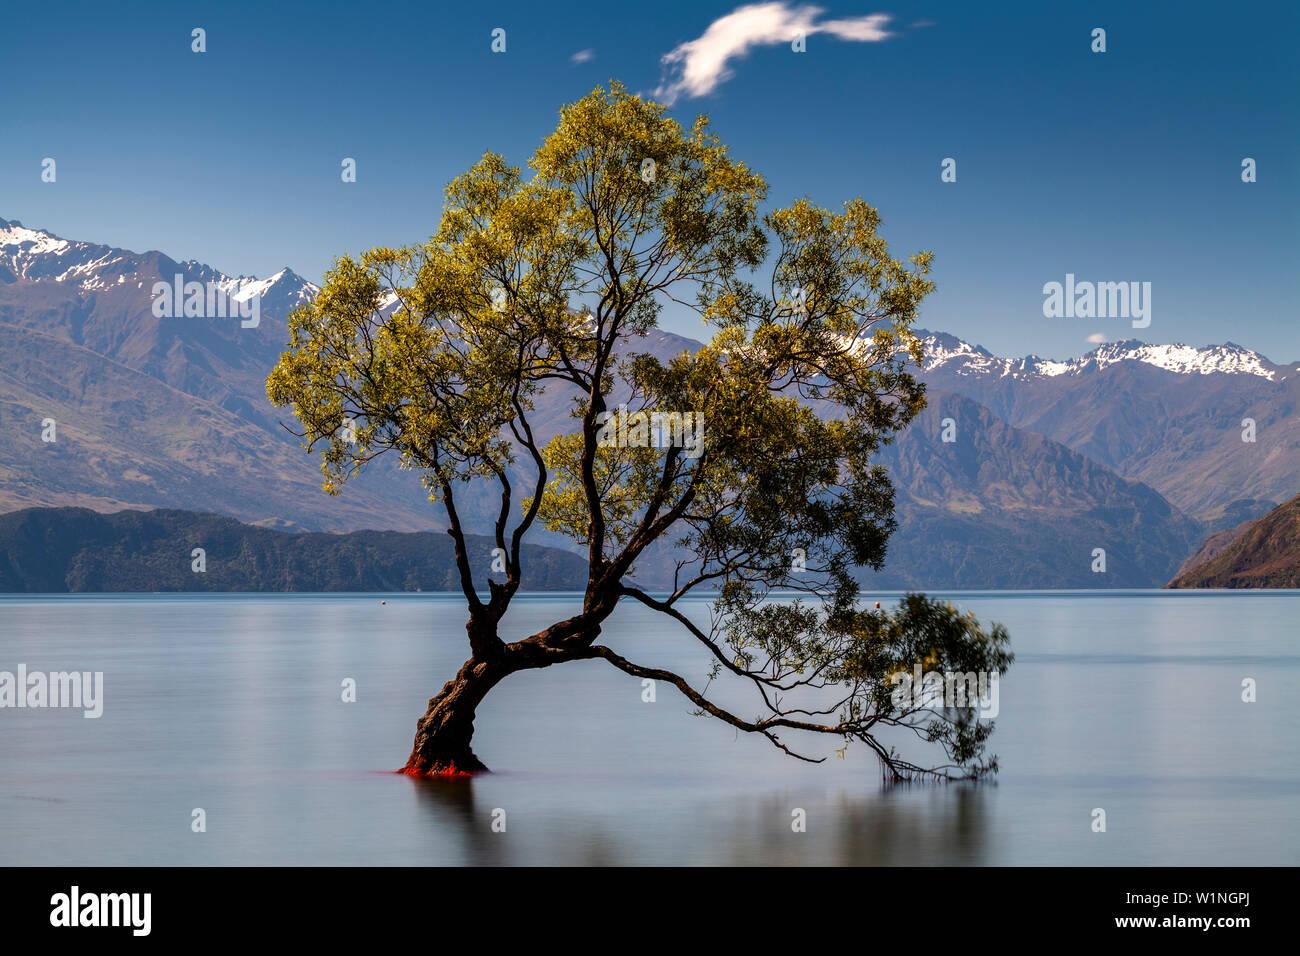 The Iconic 'Lone Tree' In The Lake, Lake Wanaka, Otago Region, South Island, New Zealand Stock Photo